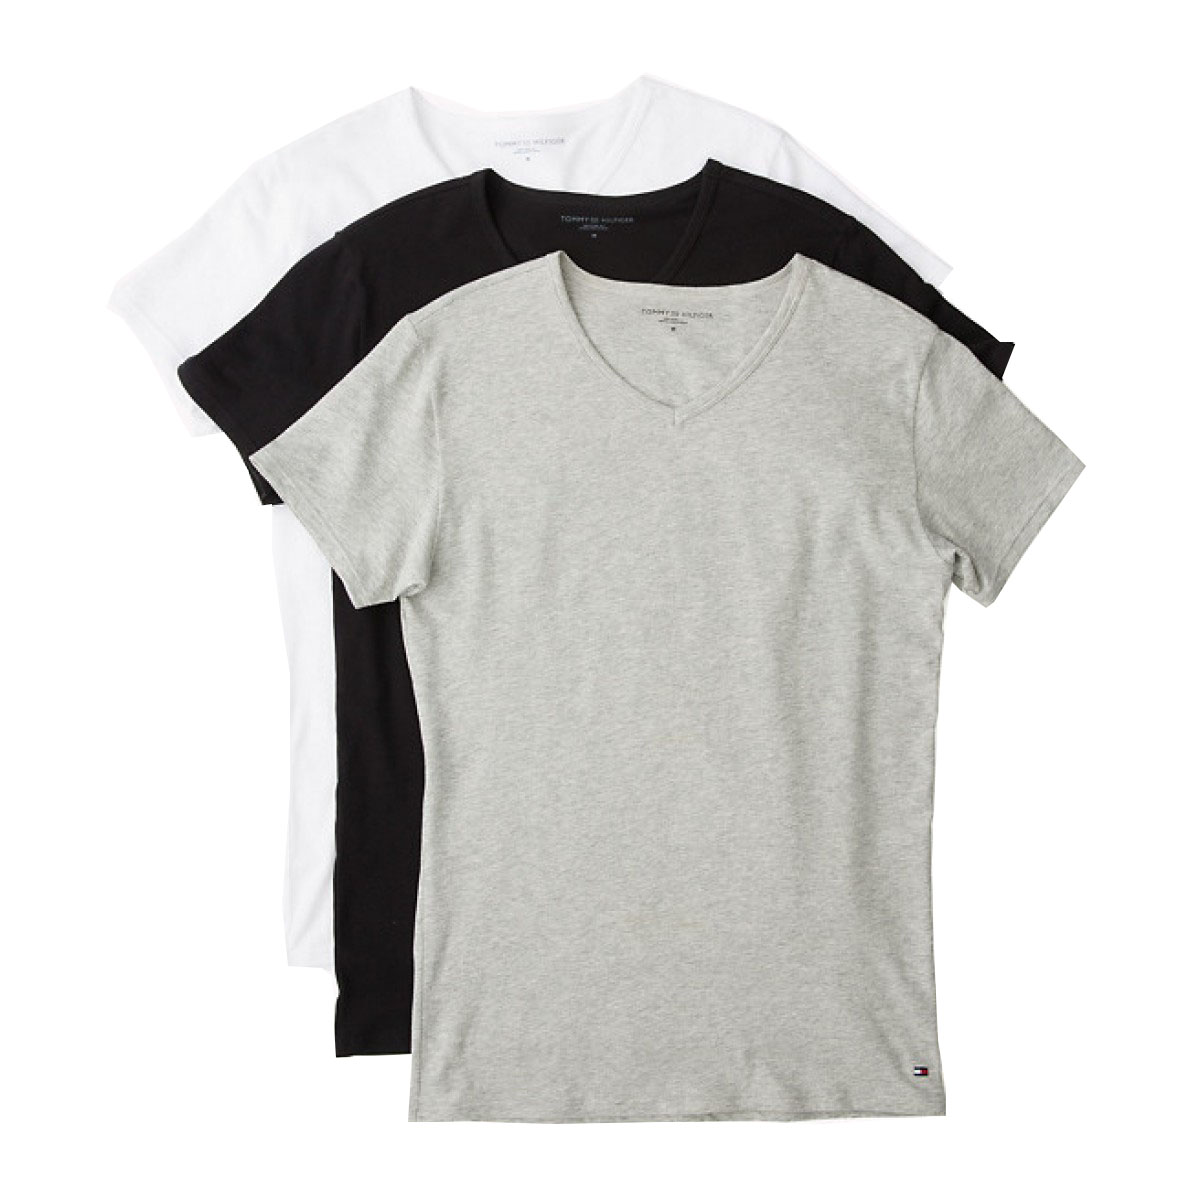 T-shirt 3 pack V neck Tommy Hilfiger 2S87903767 - γκρι-λευκό-μαύρο b990532ae02